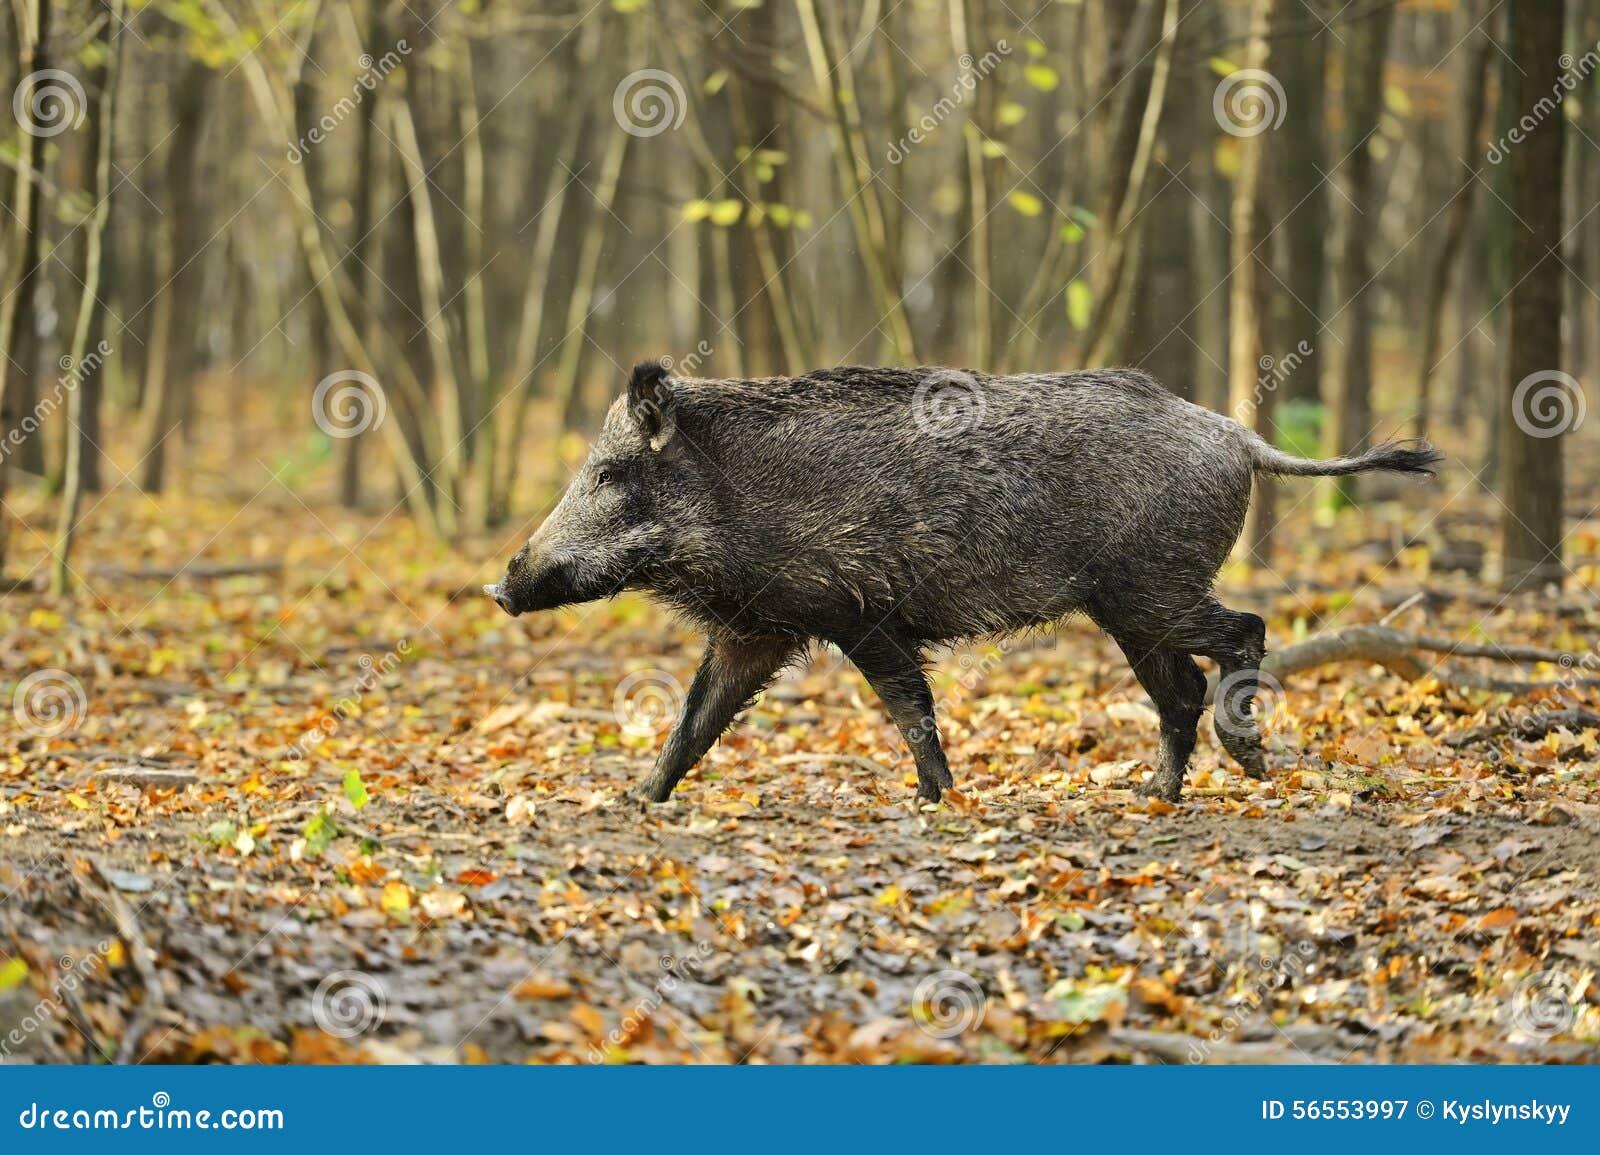 Download ρωσικές άγρια περιοχές Voronezh φύσης κάπρων περιοχής Στοκ Εικόνα - εικόνα από θέματα, παμφάγος: 56553997